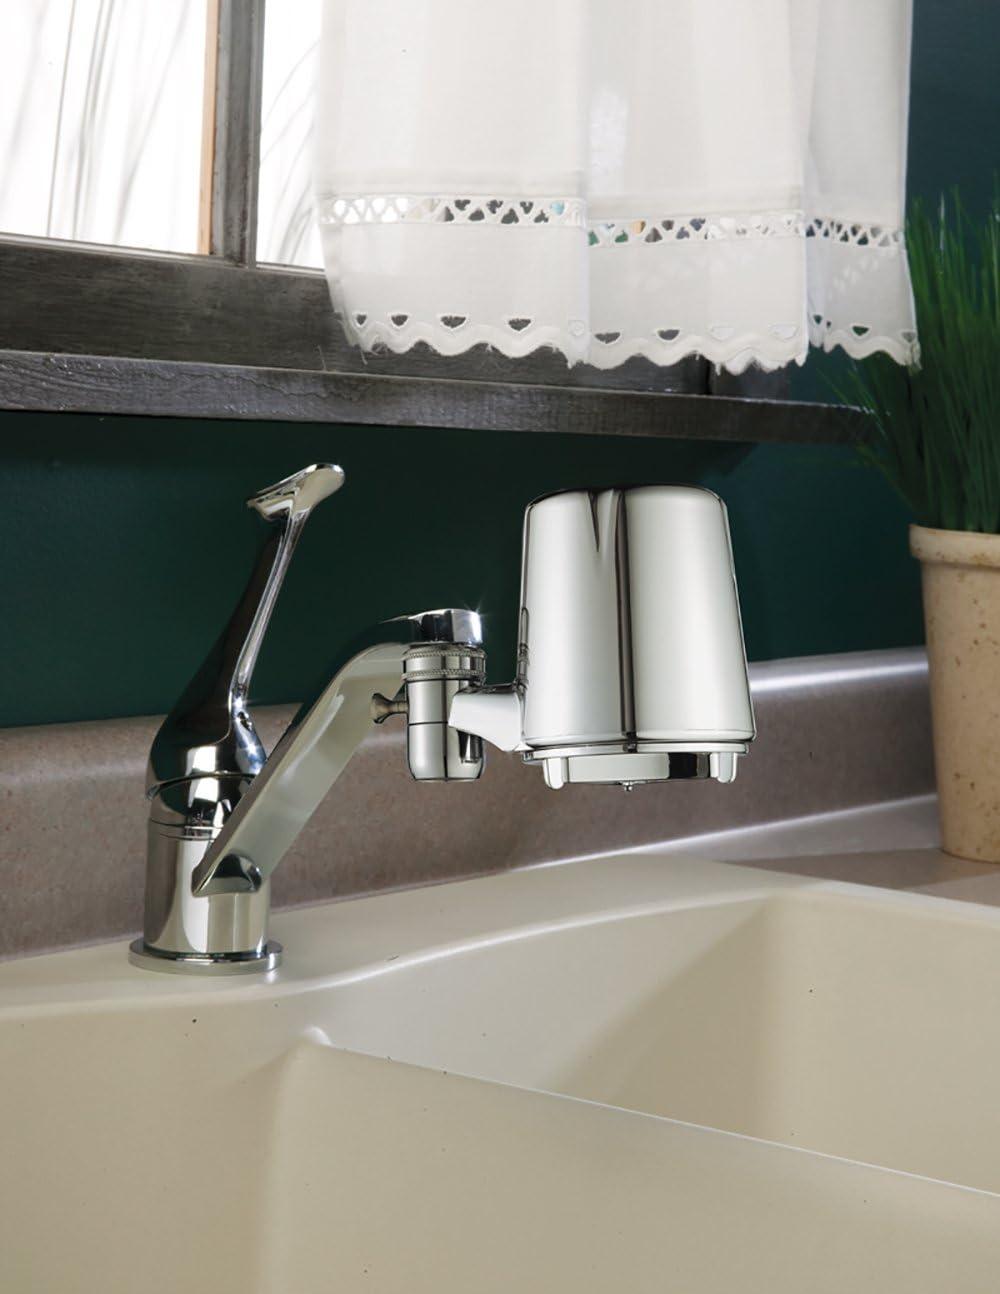 Culligan FM-25 Faucet Mount Filter- Installed